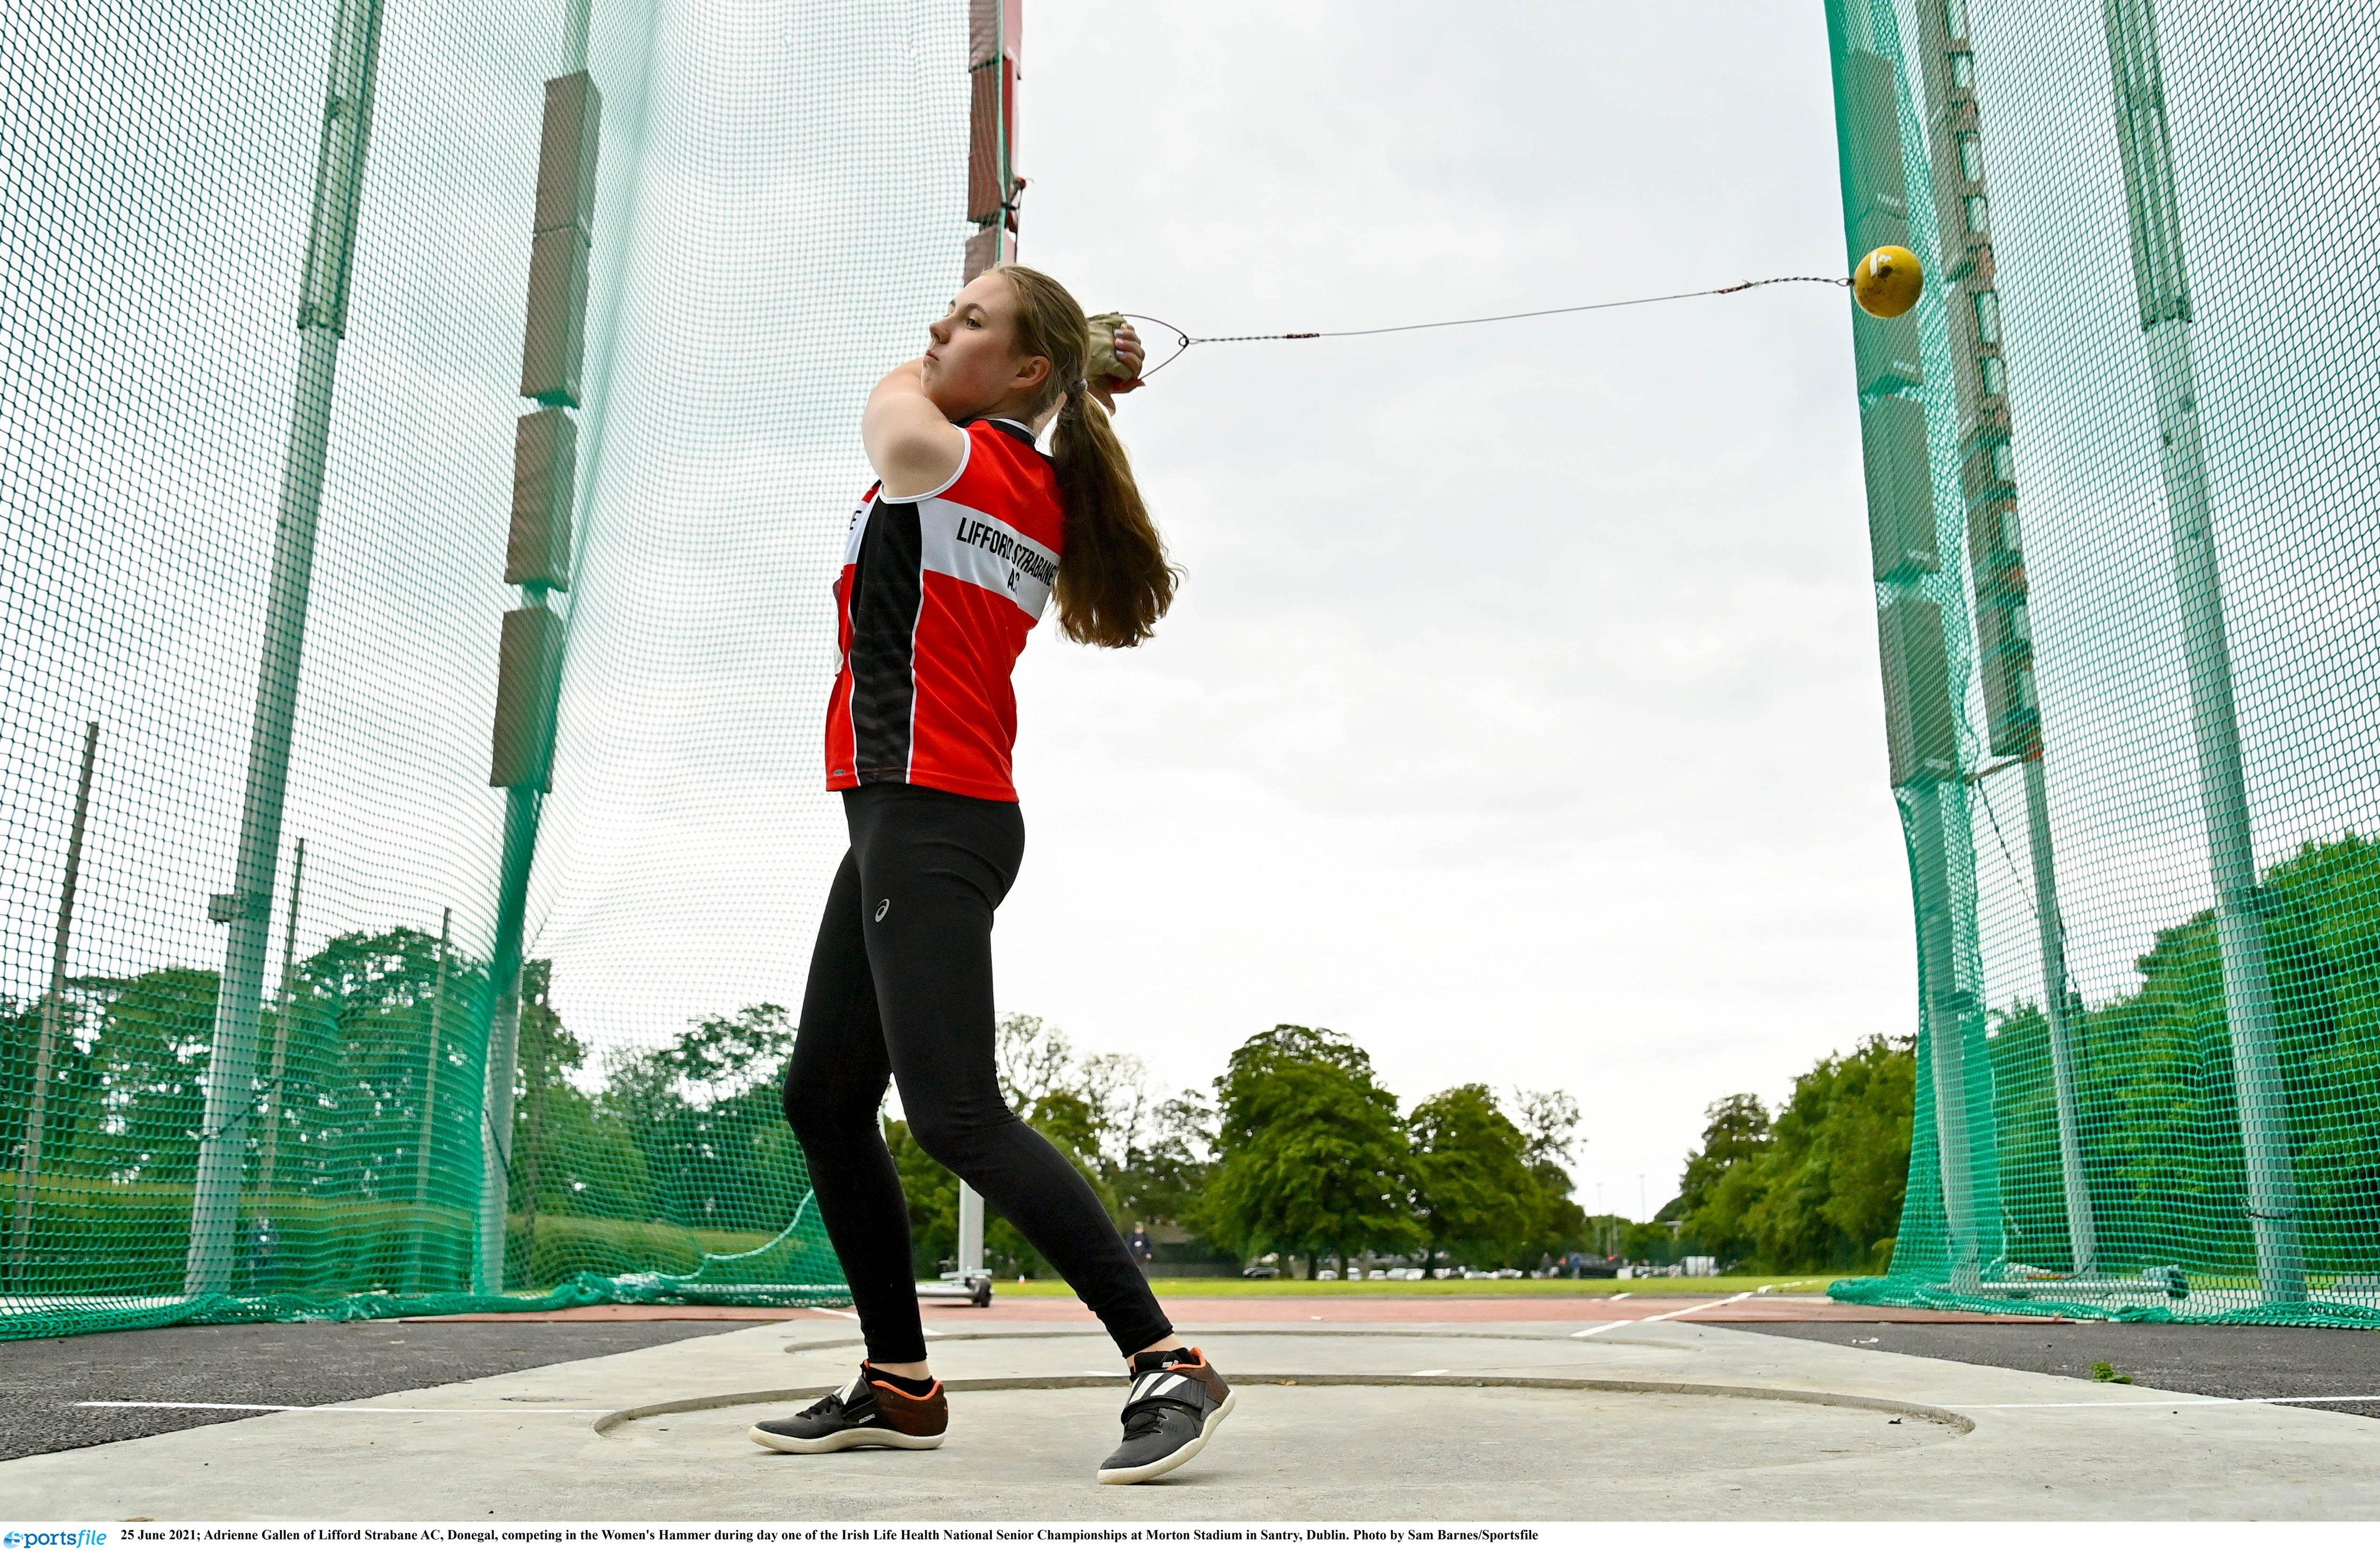 Teak-tough performances in Tullamore